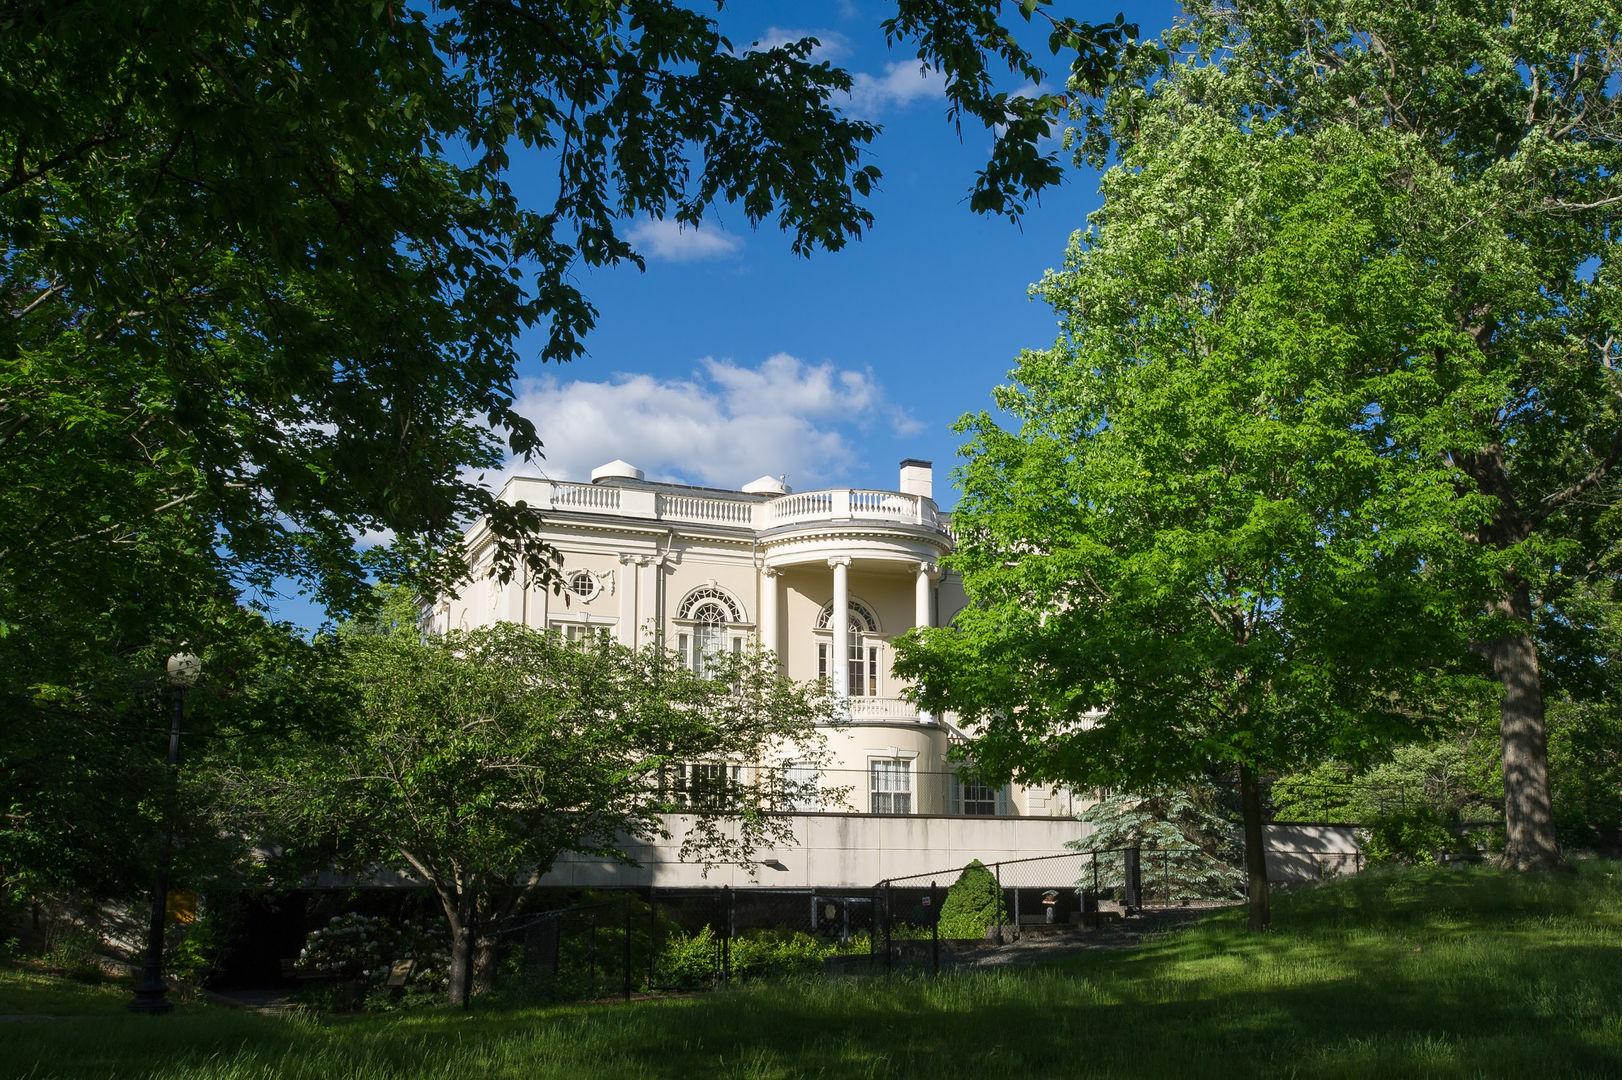 Peabody Institute Library, Danvers